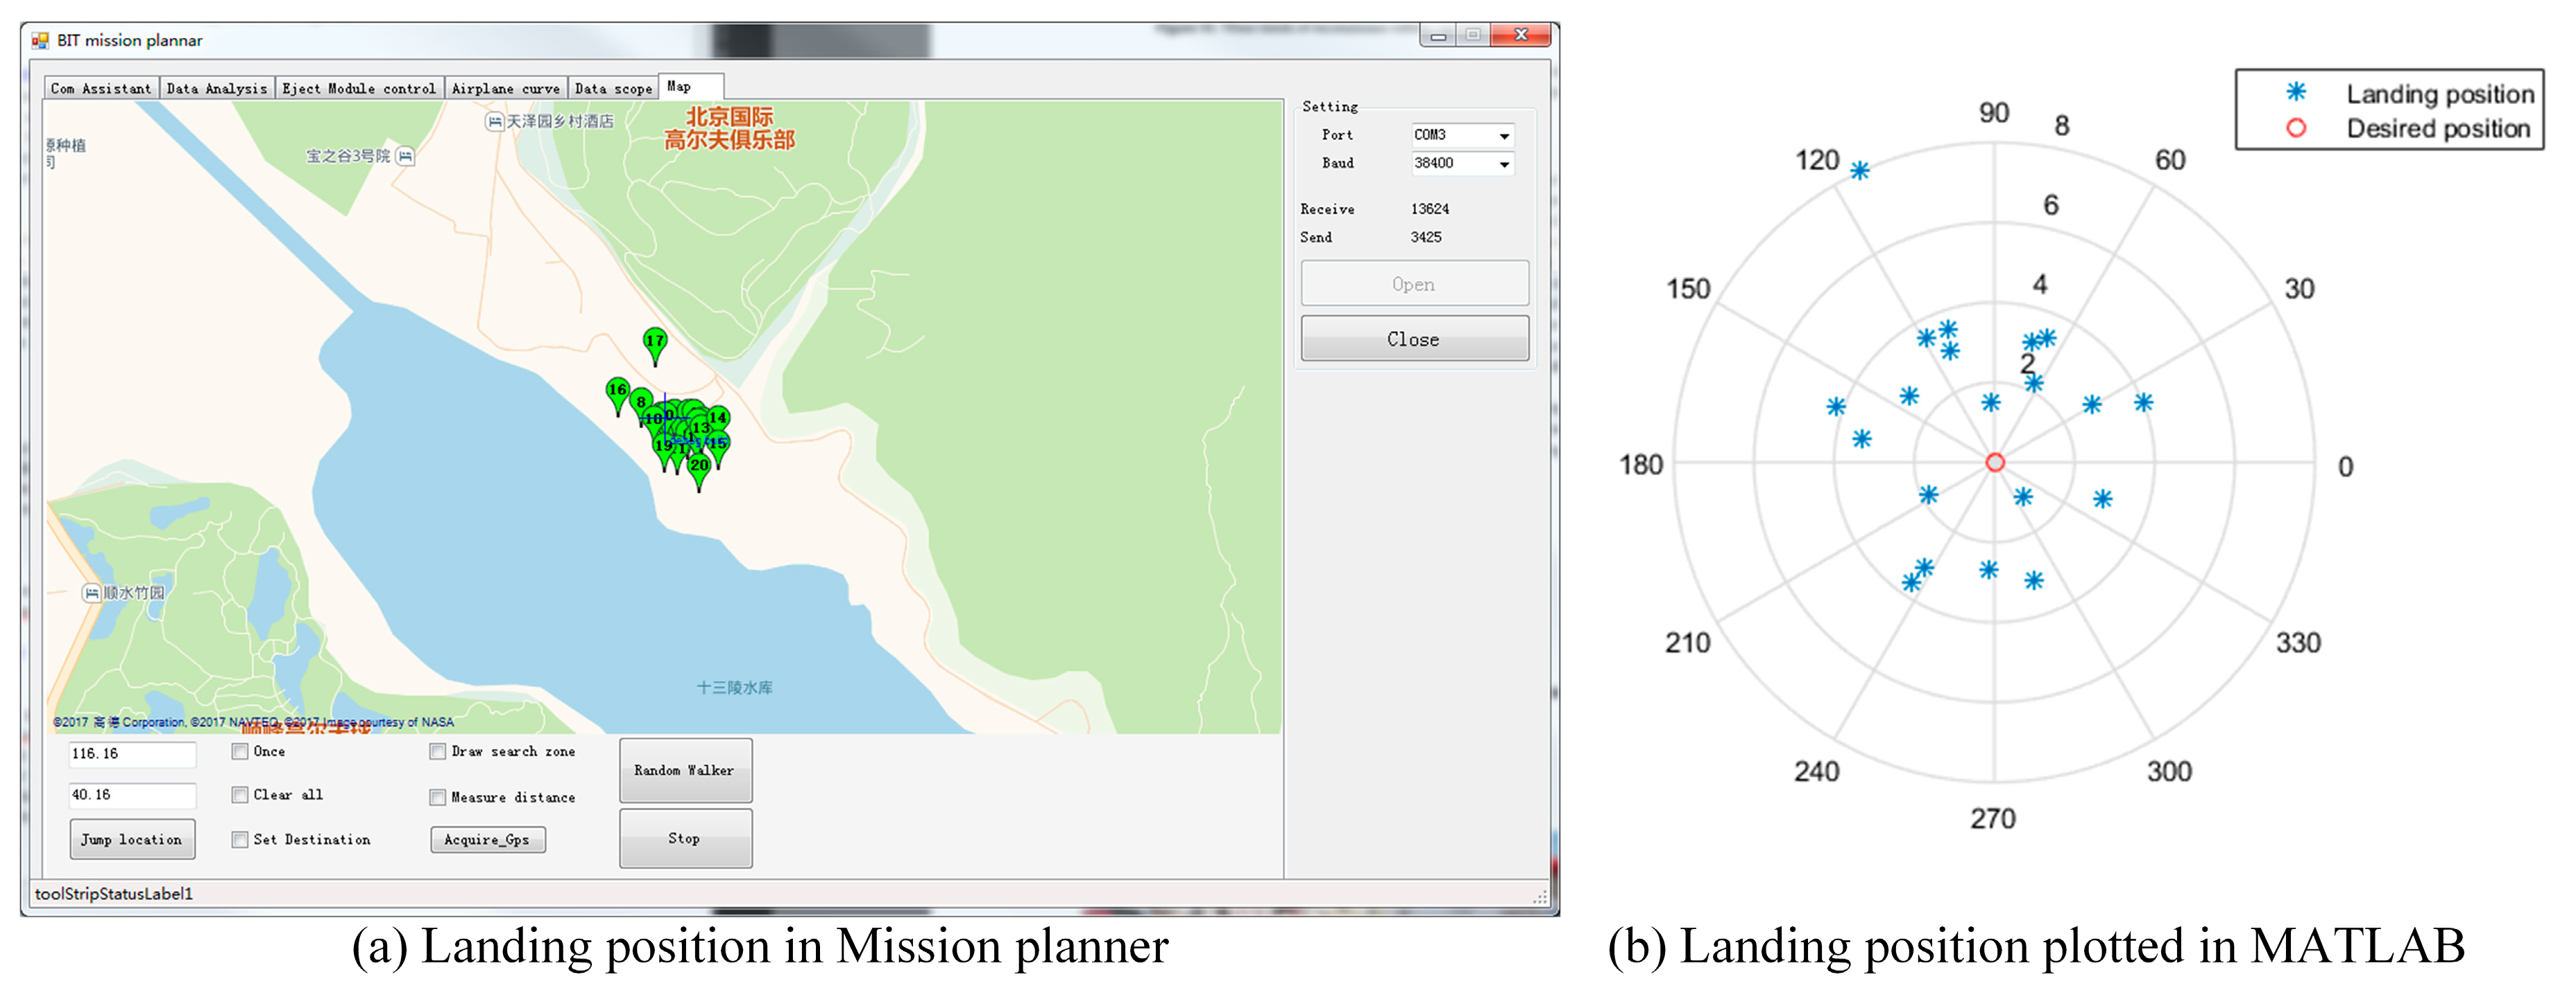 Sensors | Free Full-Text | A New Disaster Information Sensing Mode